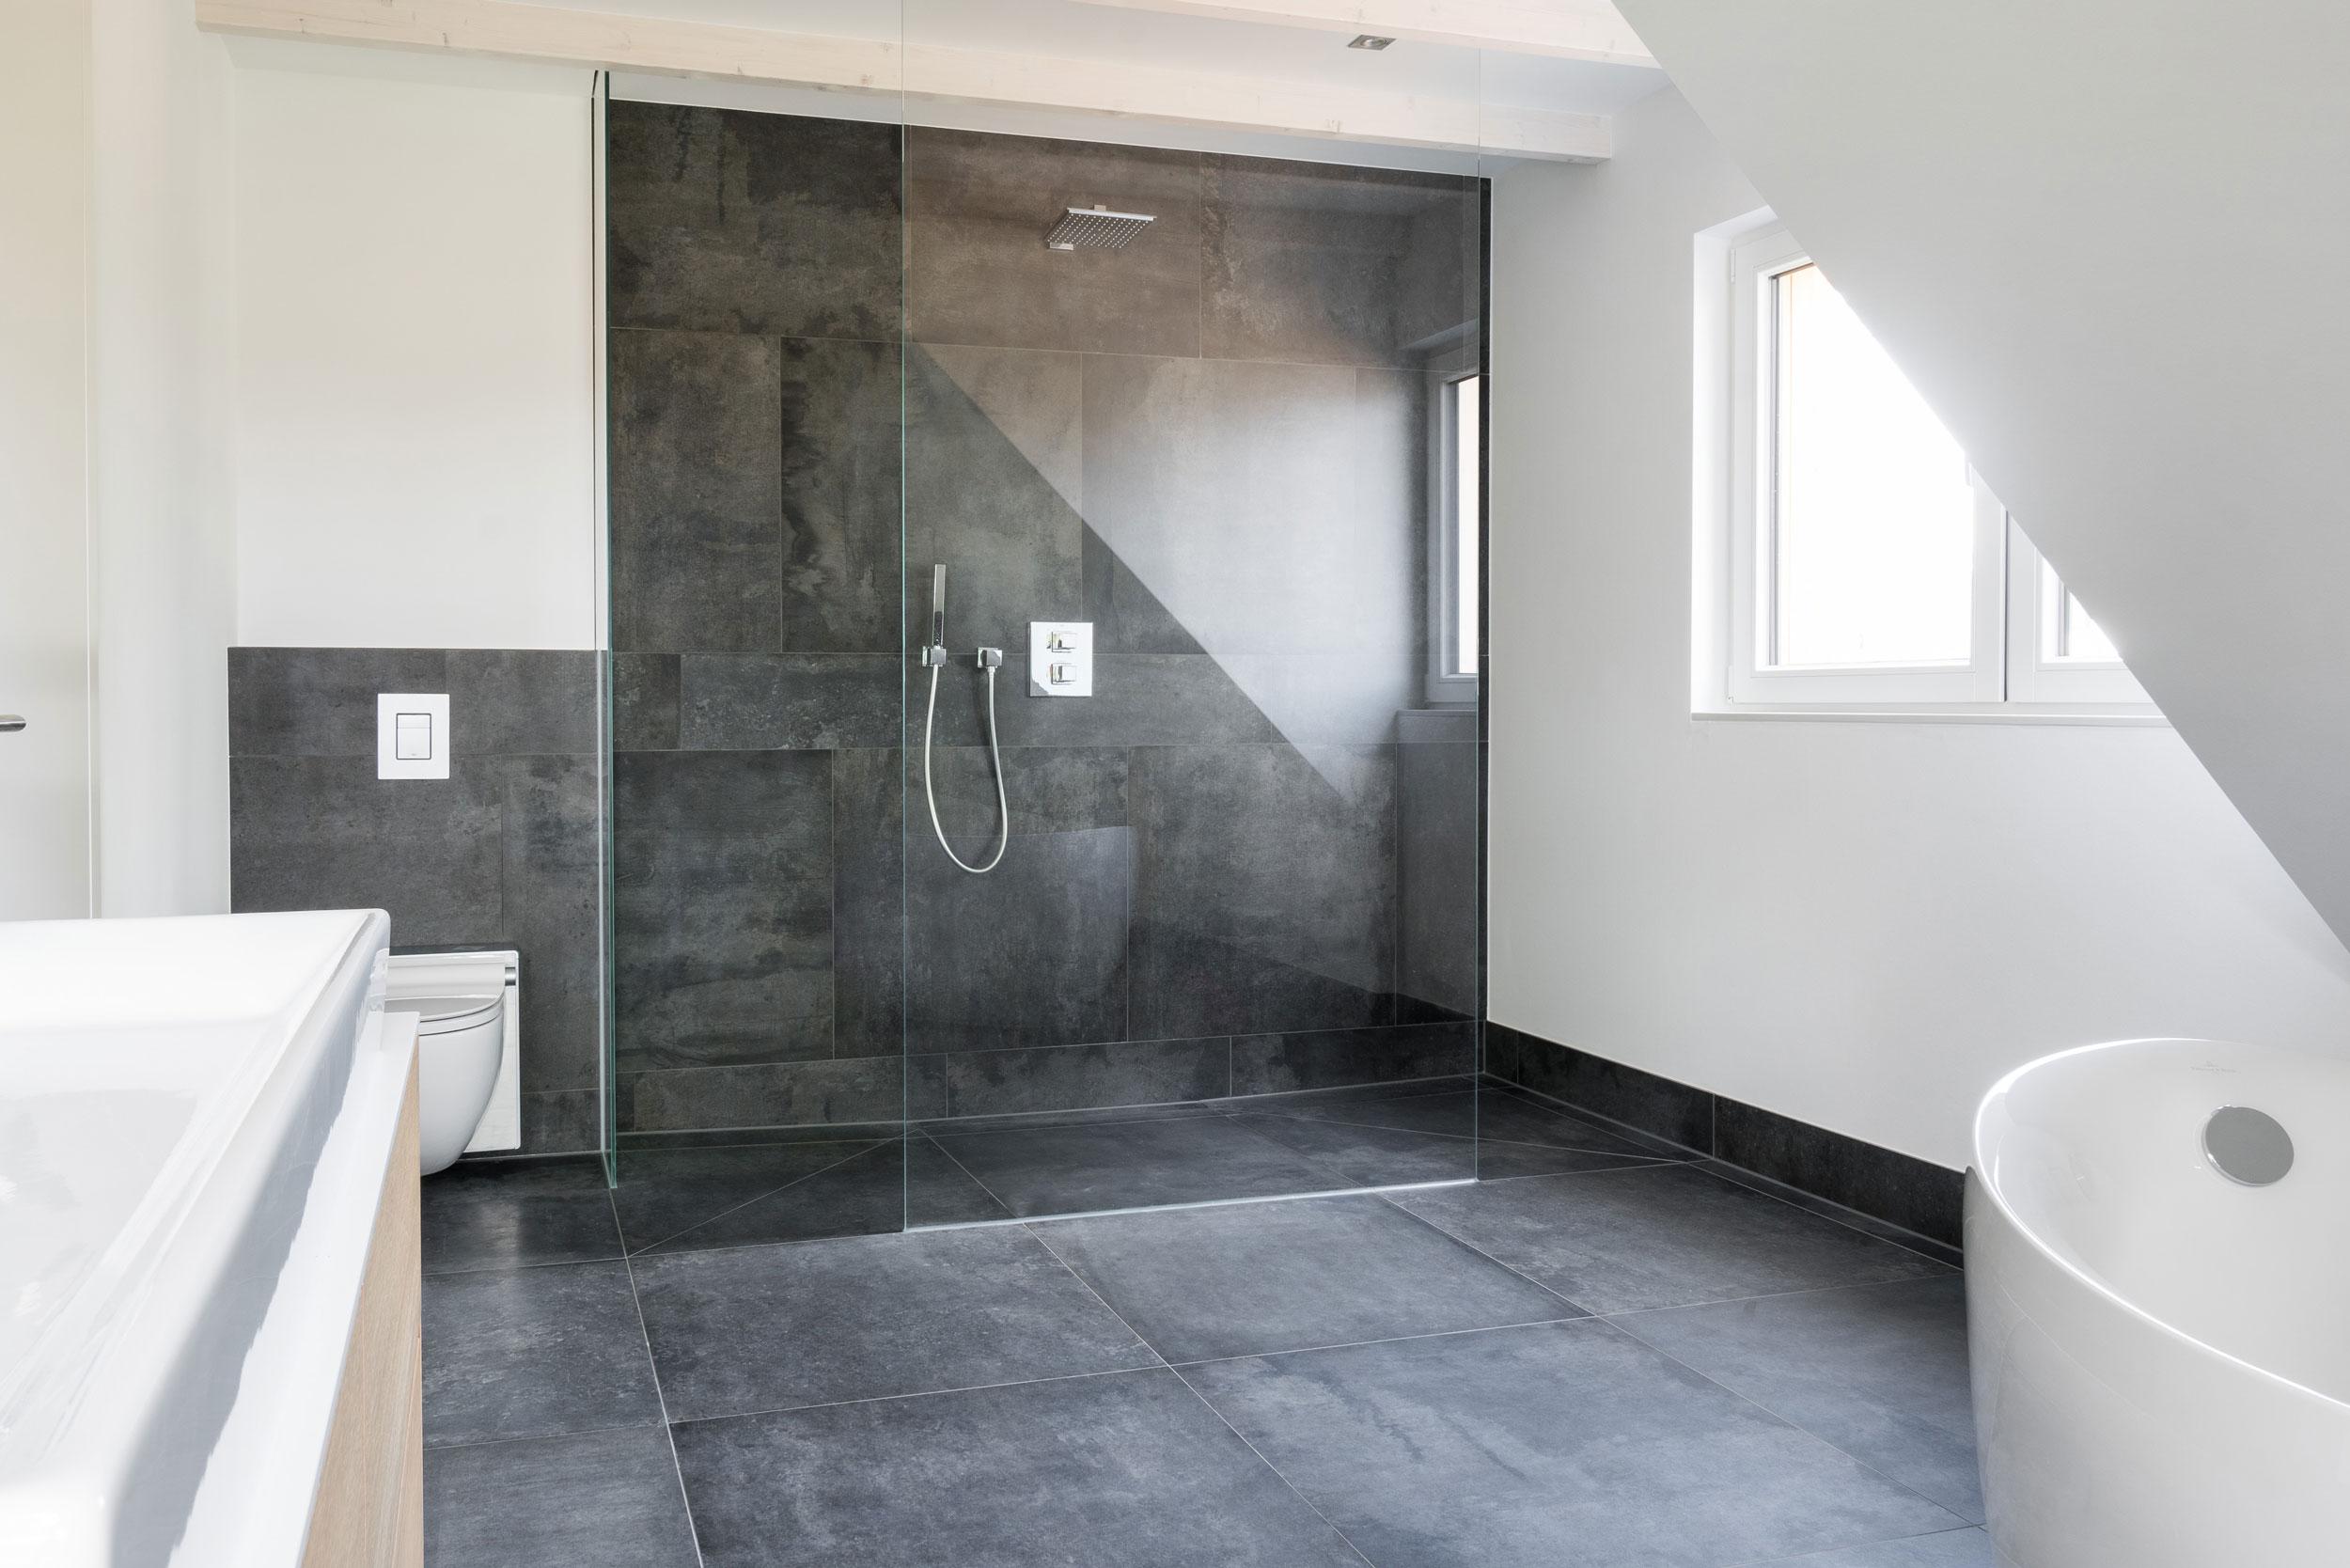 fliesen rothe fliesen sind rothe. Black Bedroom Furniture Sets. Home Design Ideas